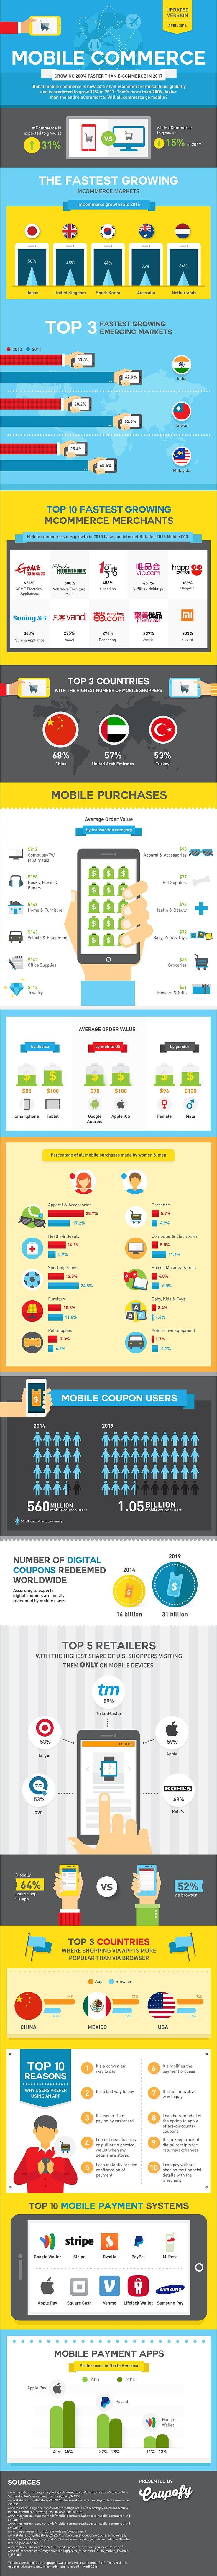 State Of Mobile Commerce - April 2016: http://blog.hubspot.com/marketing/mobile-commerce-growth-global